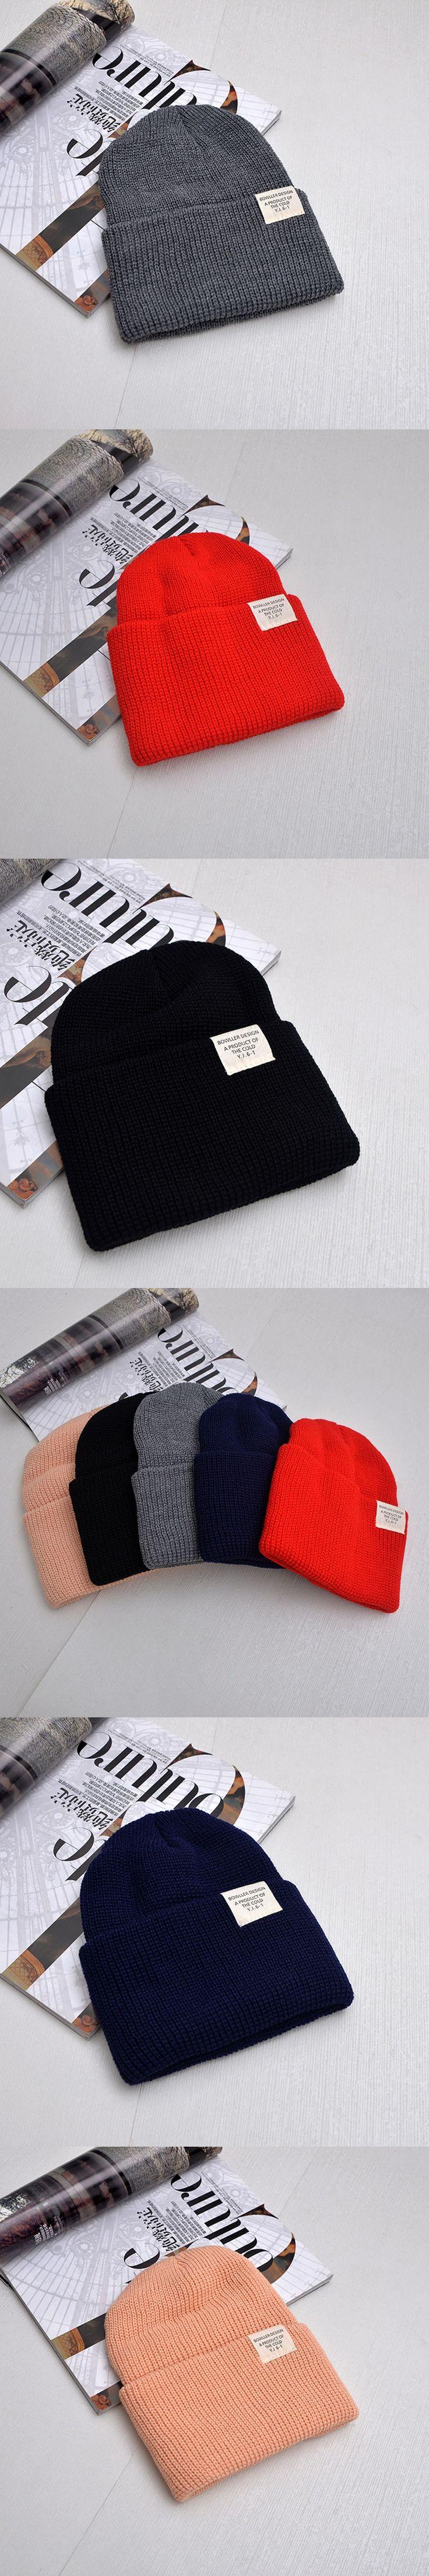 Simple Outdoor Patch Hat For Women Girls Men Boys Knitted Hats Female Male Autumn Winter Beanies Skullies bonnet Beanie Caps